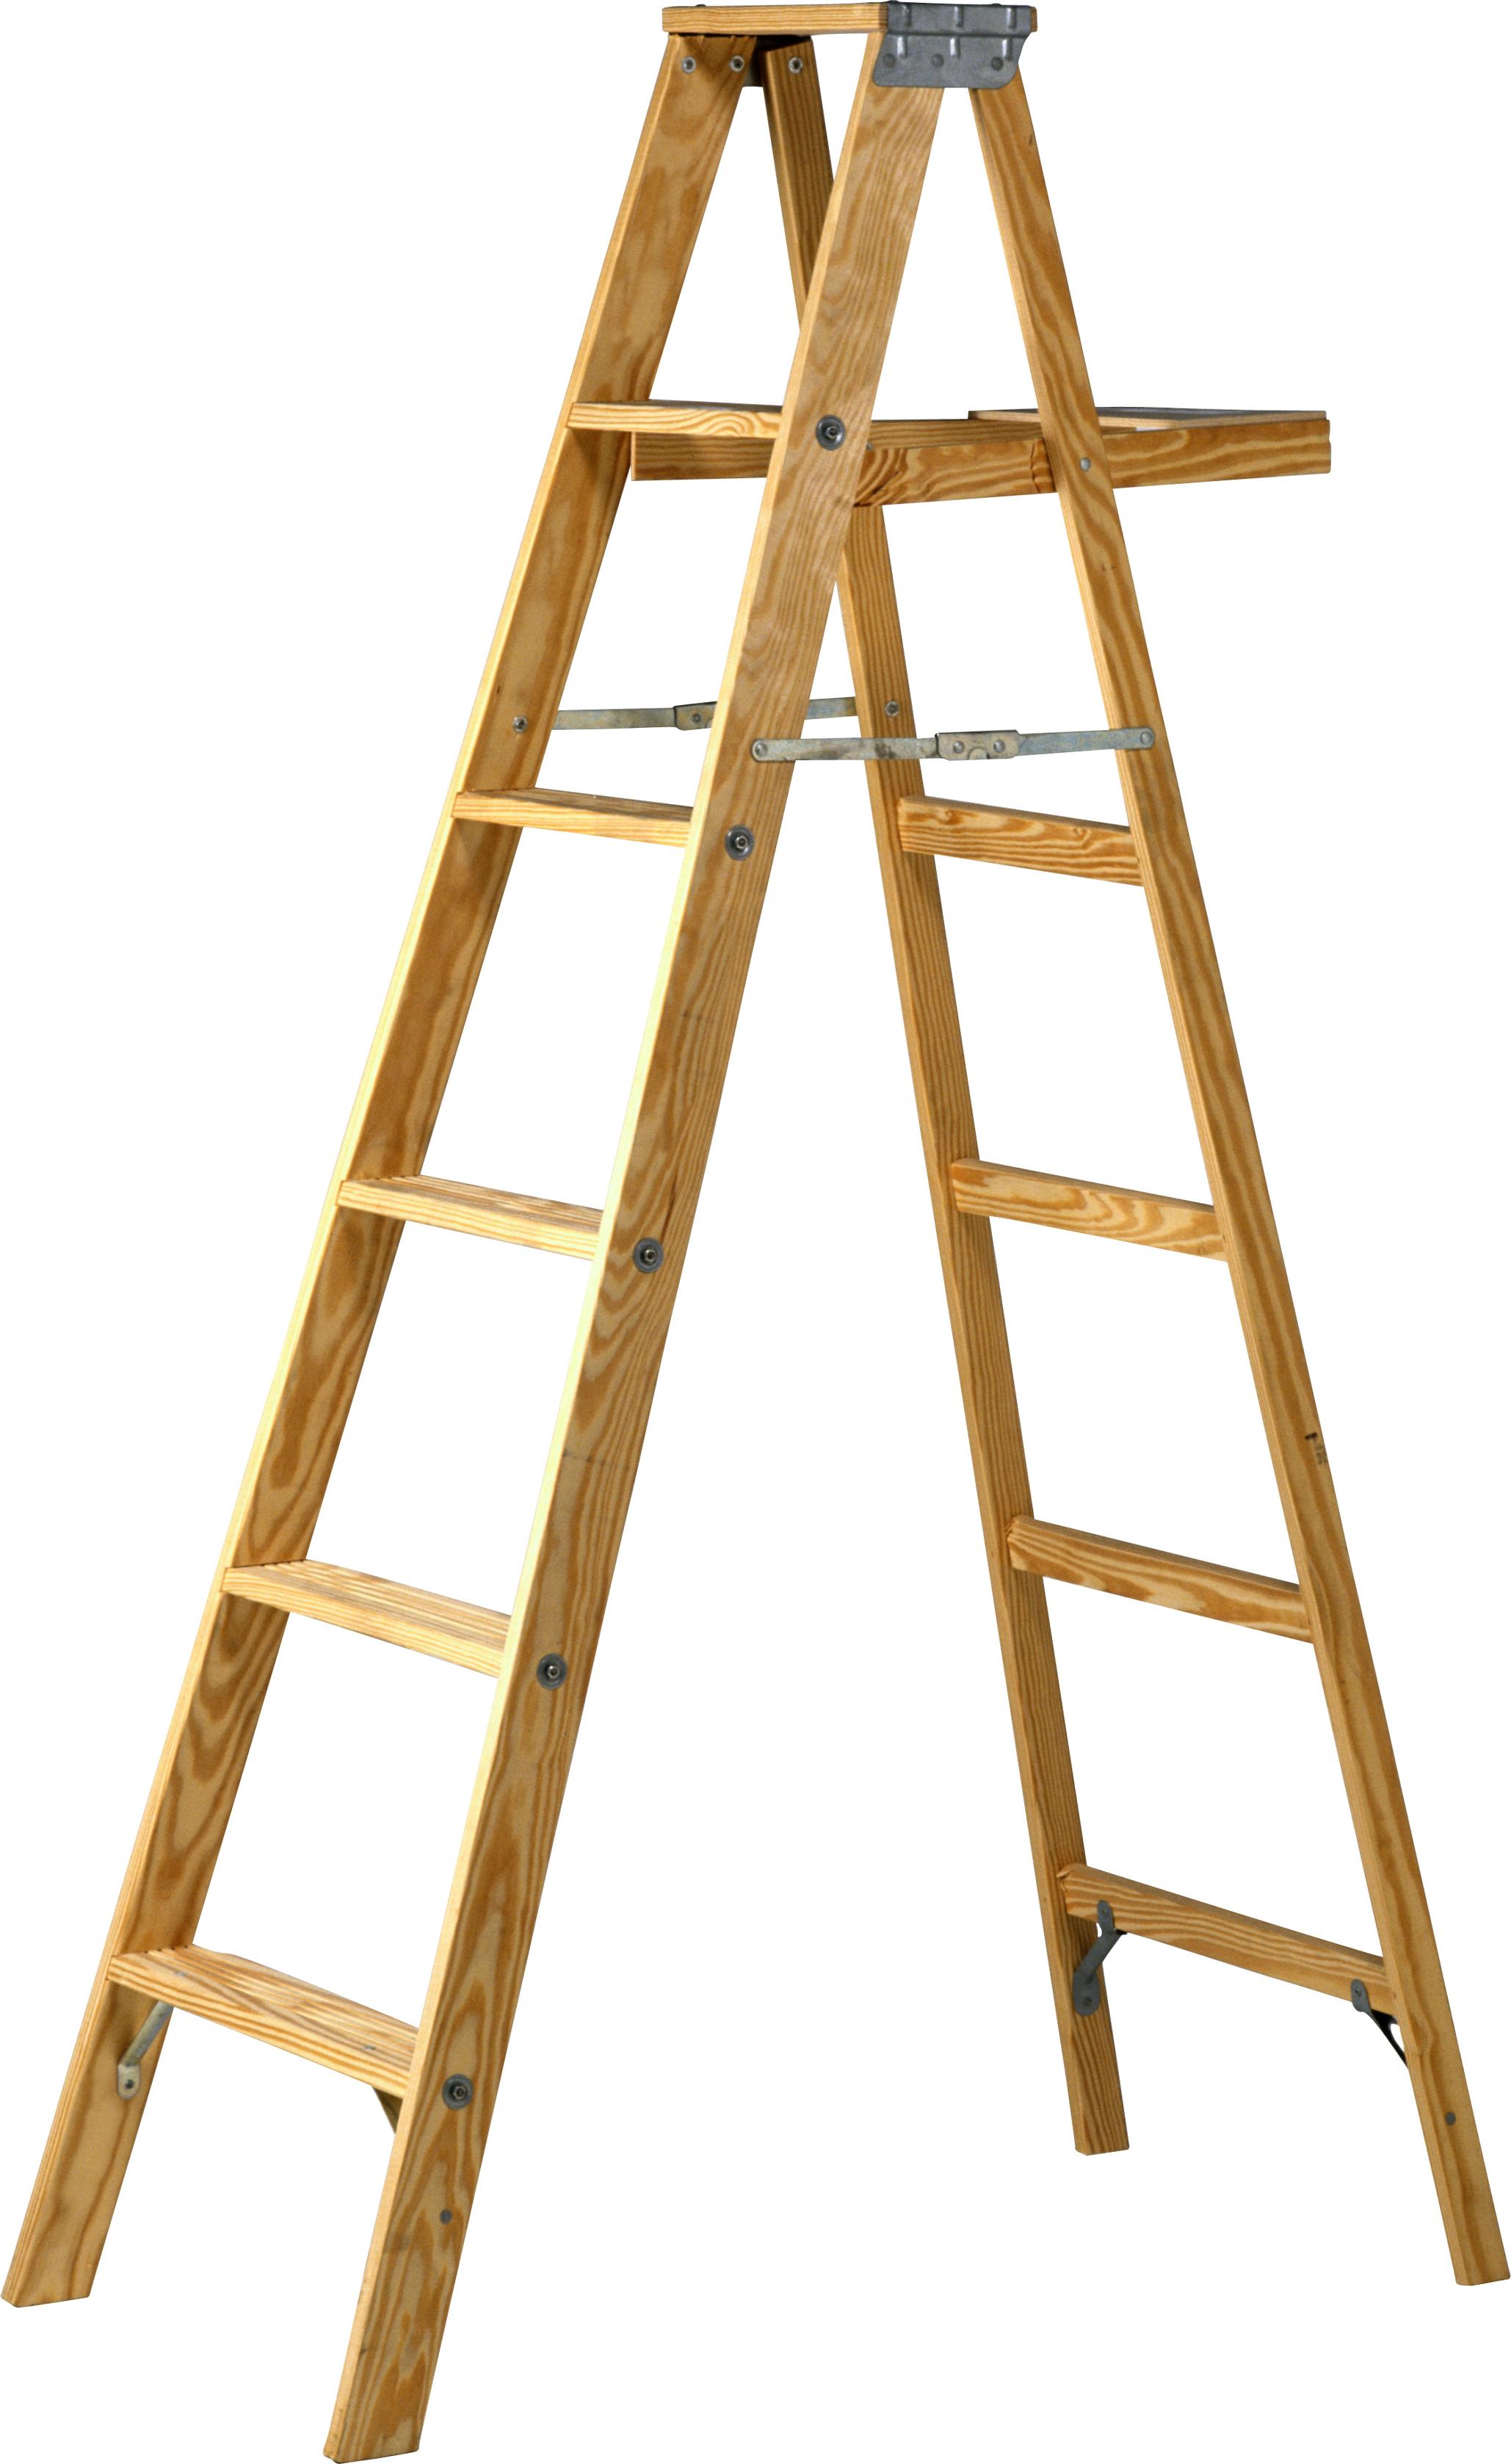 Png . Ladder clipart rope ladder